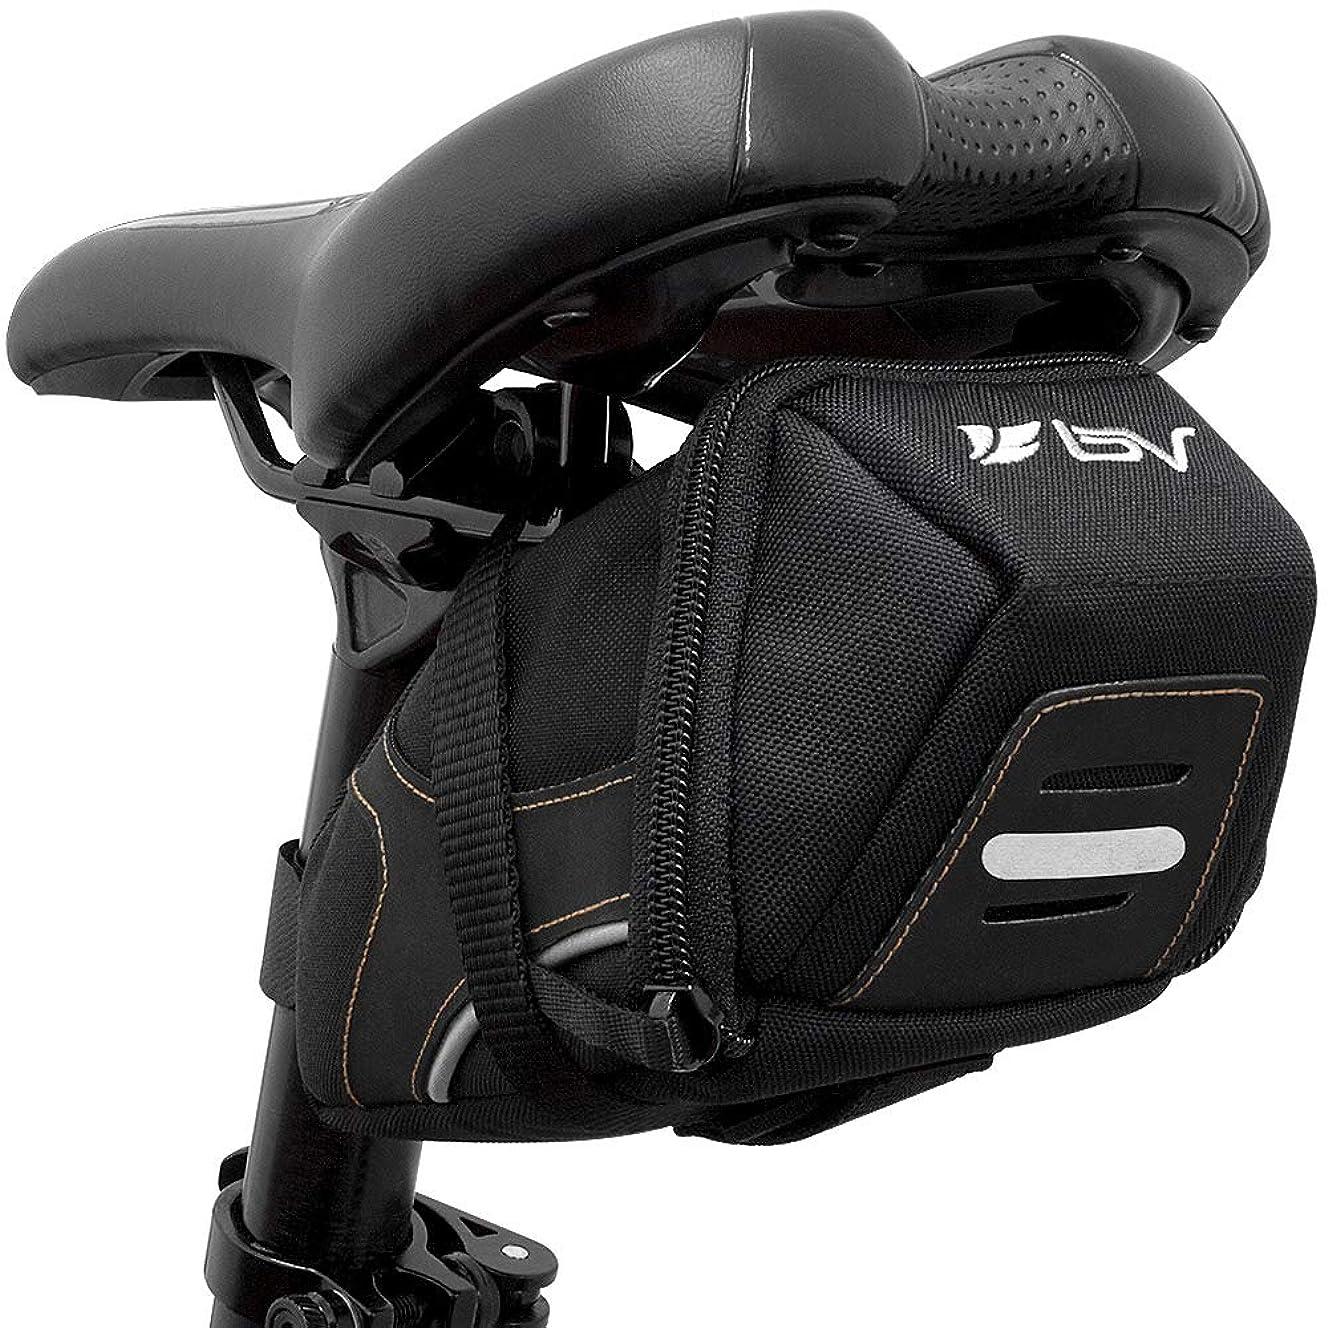 BV Bicycle Y-Series Strap-On Bike Saddle Bag/Bicycle Seat Pack Bag, Cycling Wedge Multi-Size Options